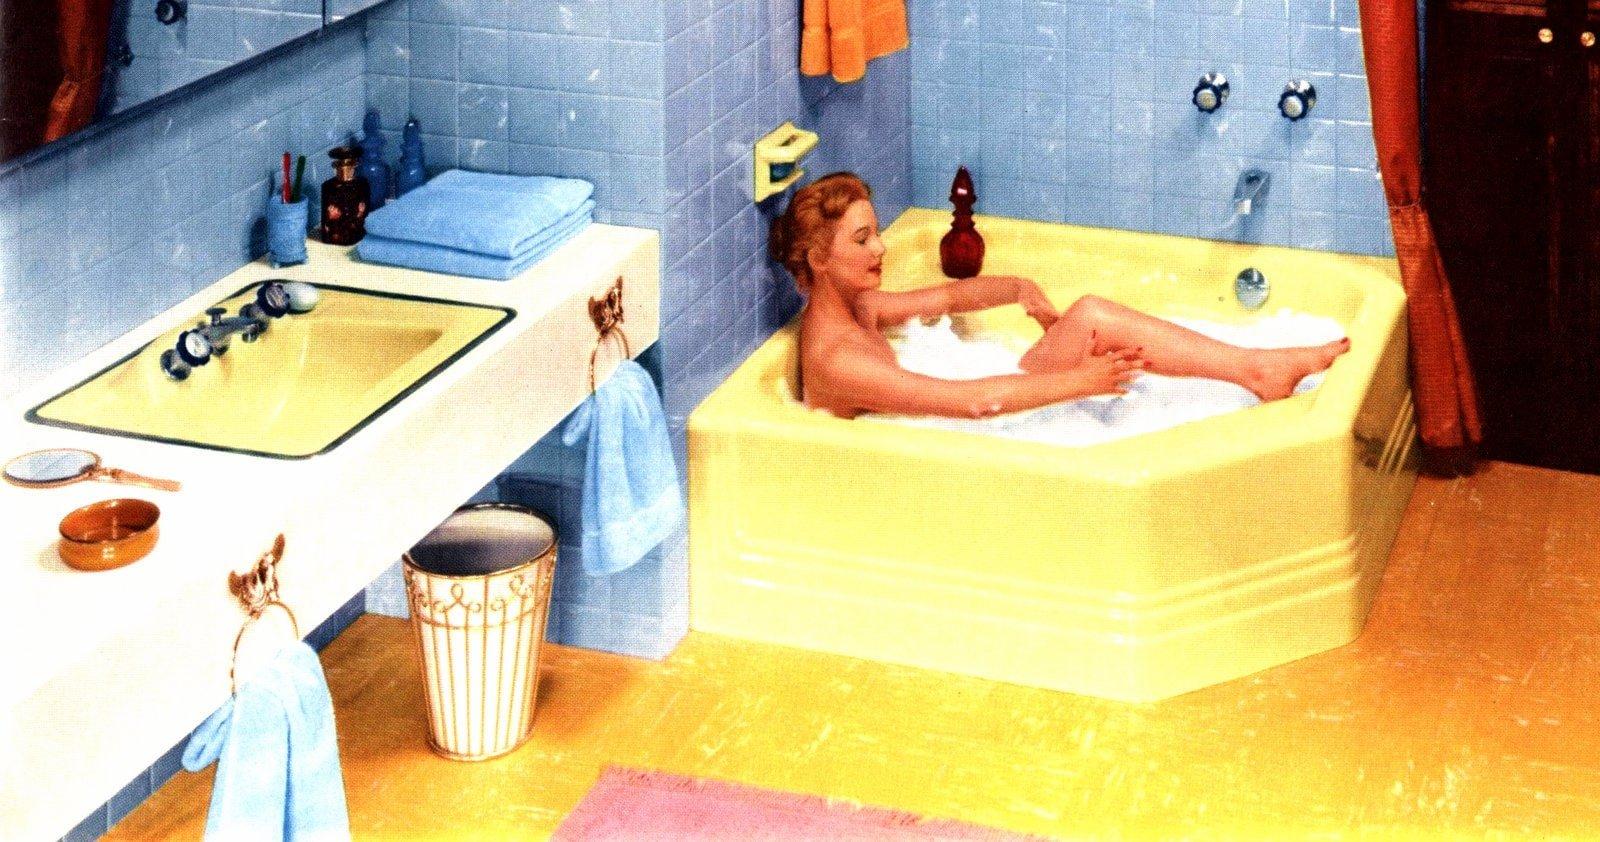 Vintage blue bathroom tile design ideas from the 1950s